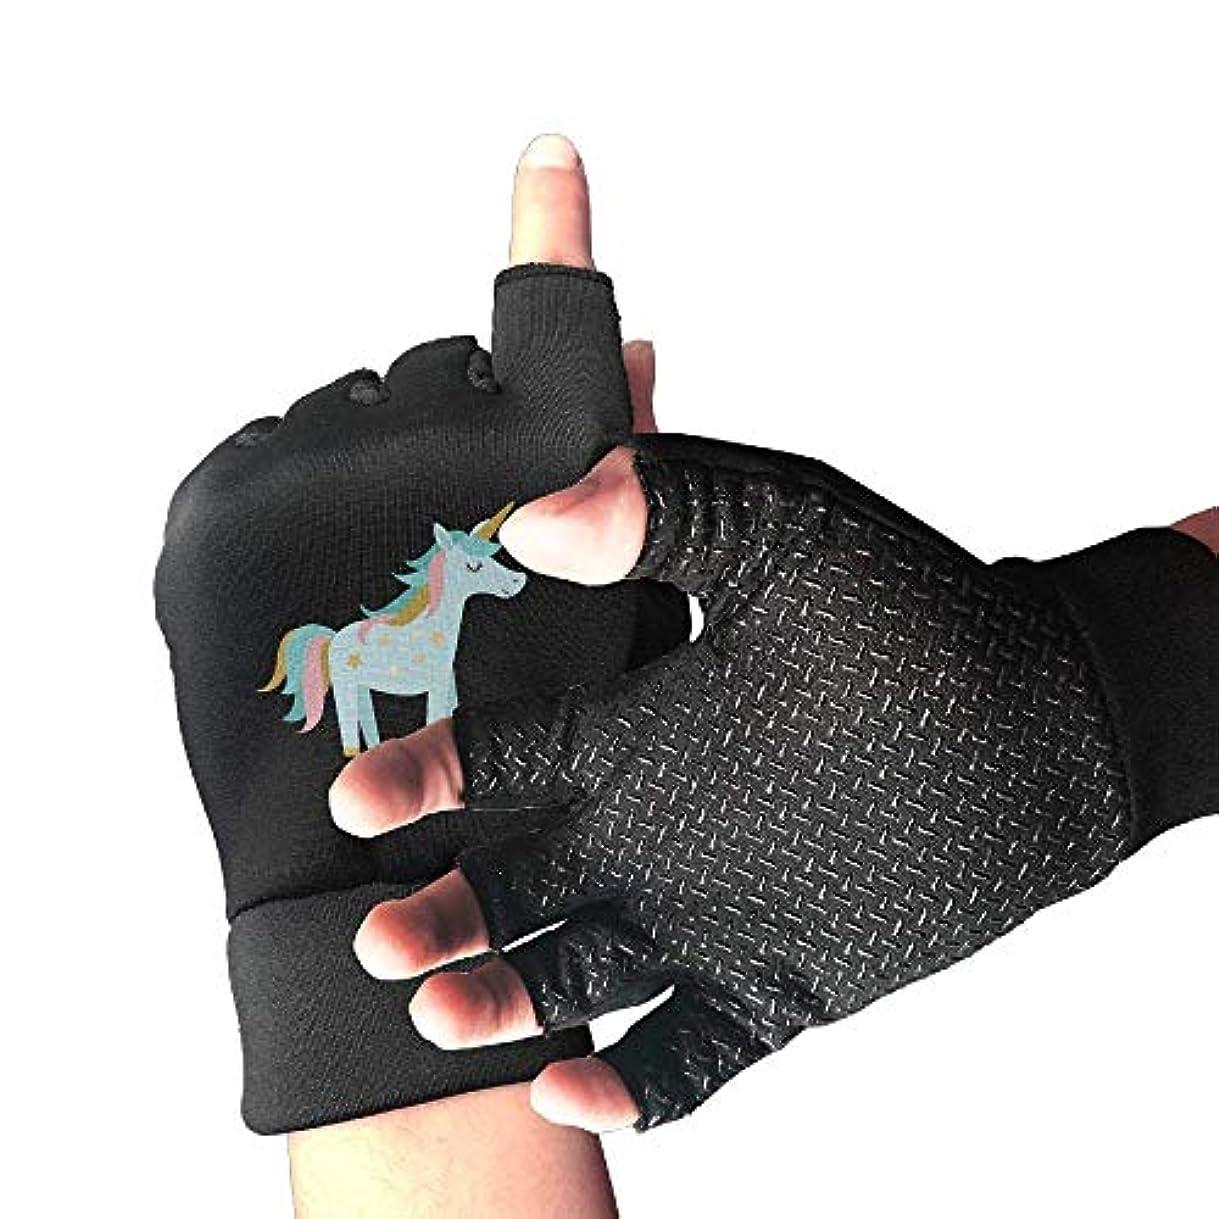 品種勤勉不完全Cycling Gloves Unicorn Men's/Women's Mountain Bike Gloves Half Finger Anti-Slip Motorcycle Gloves